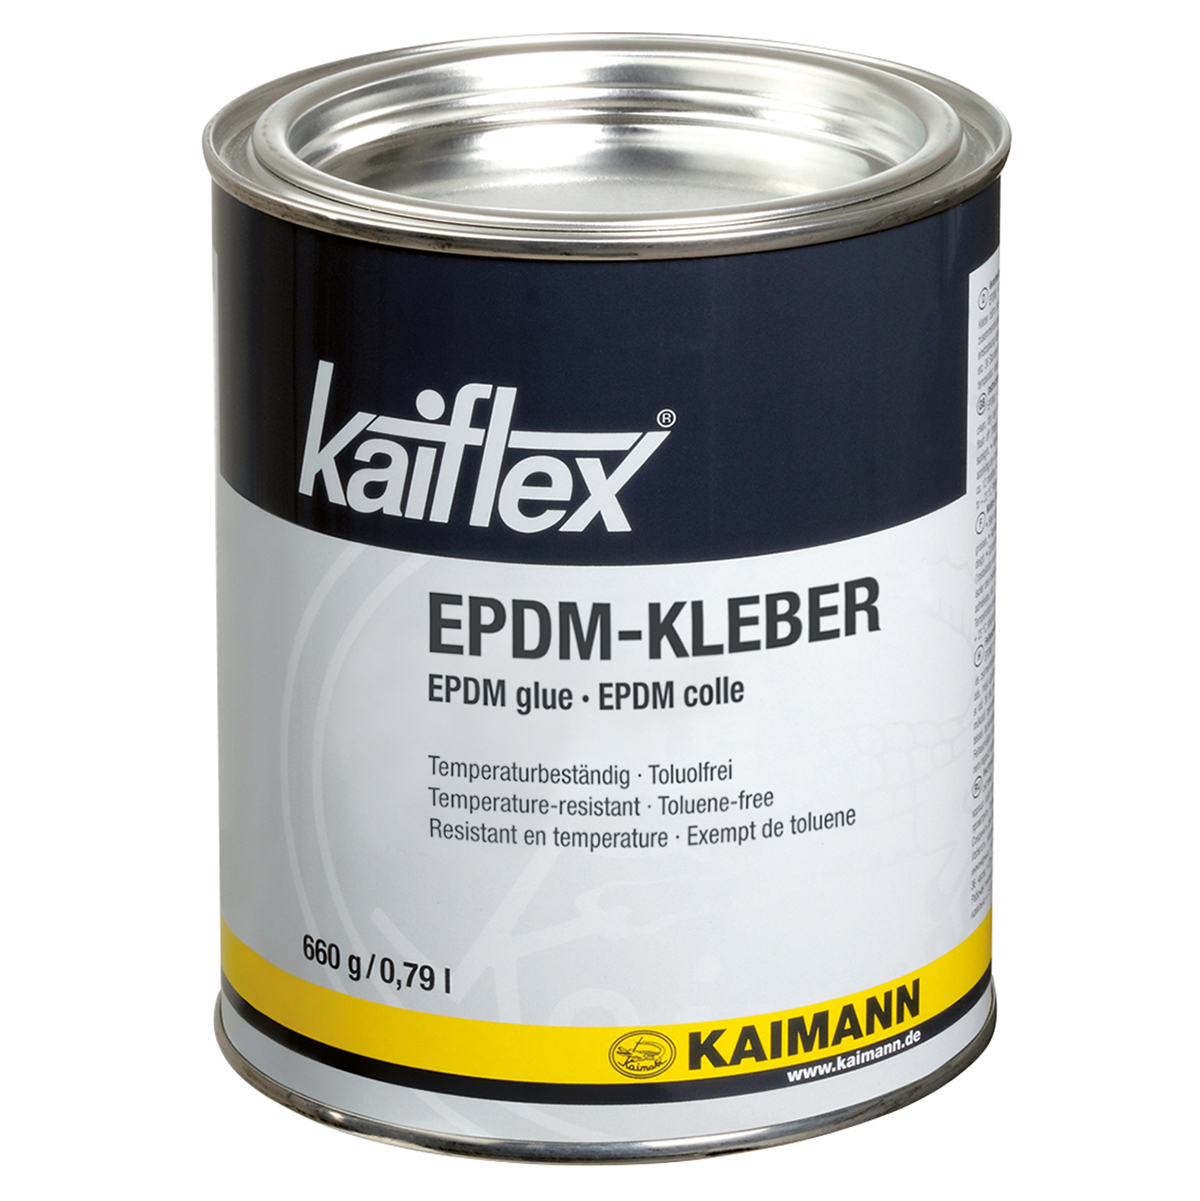 Kaiflex EPDM Kleber